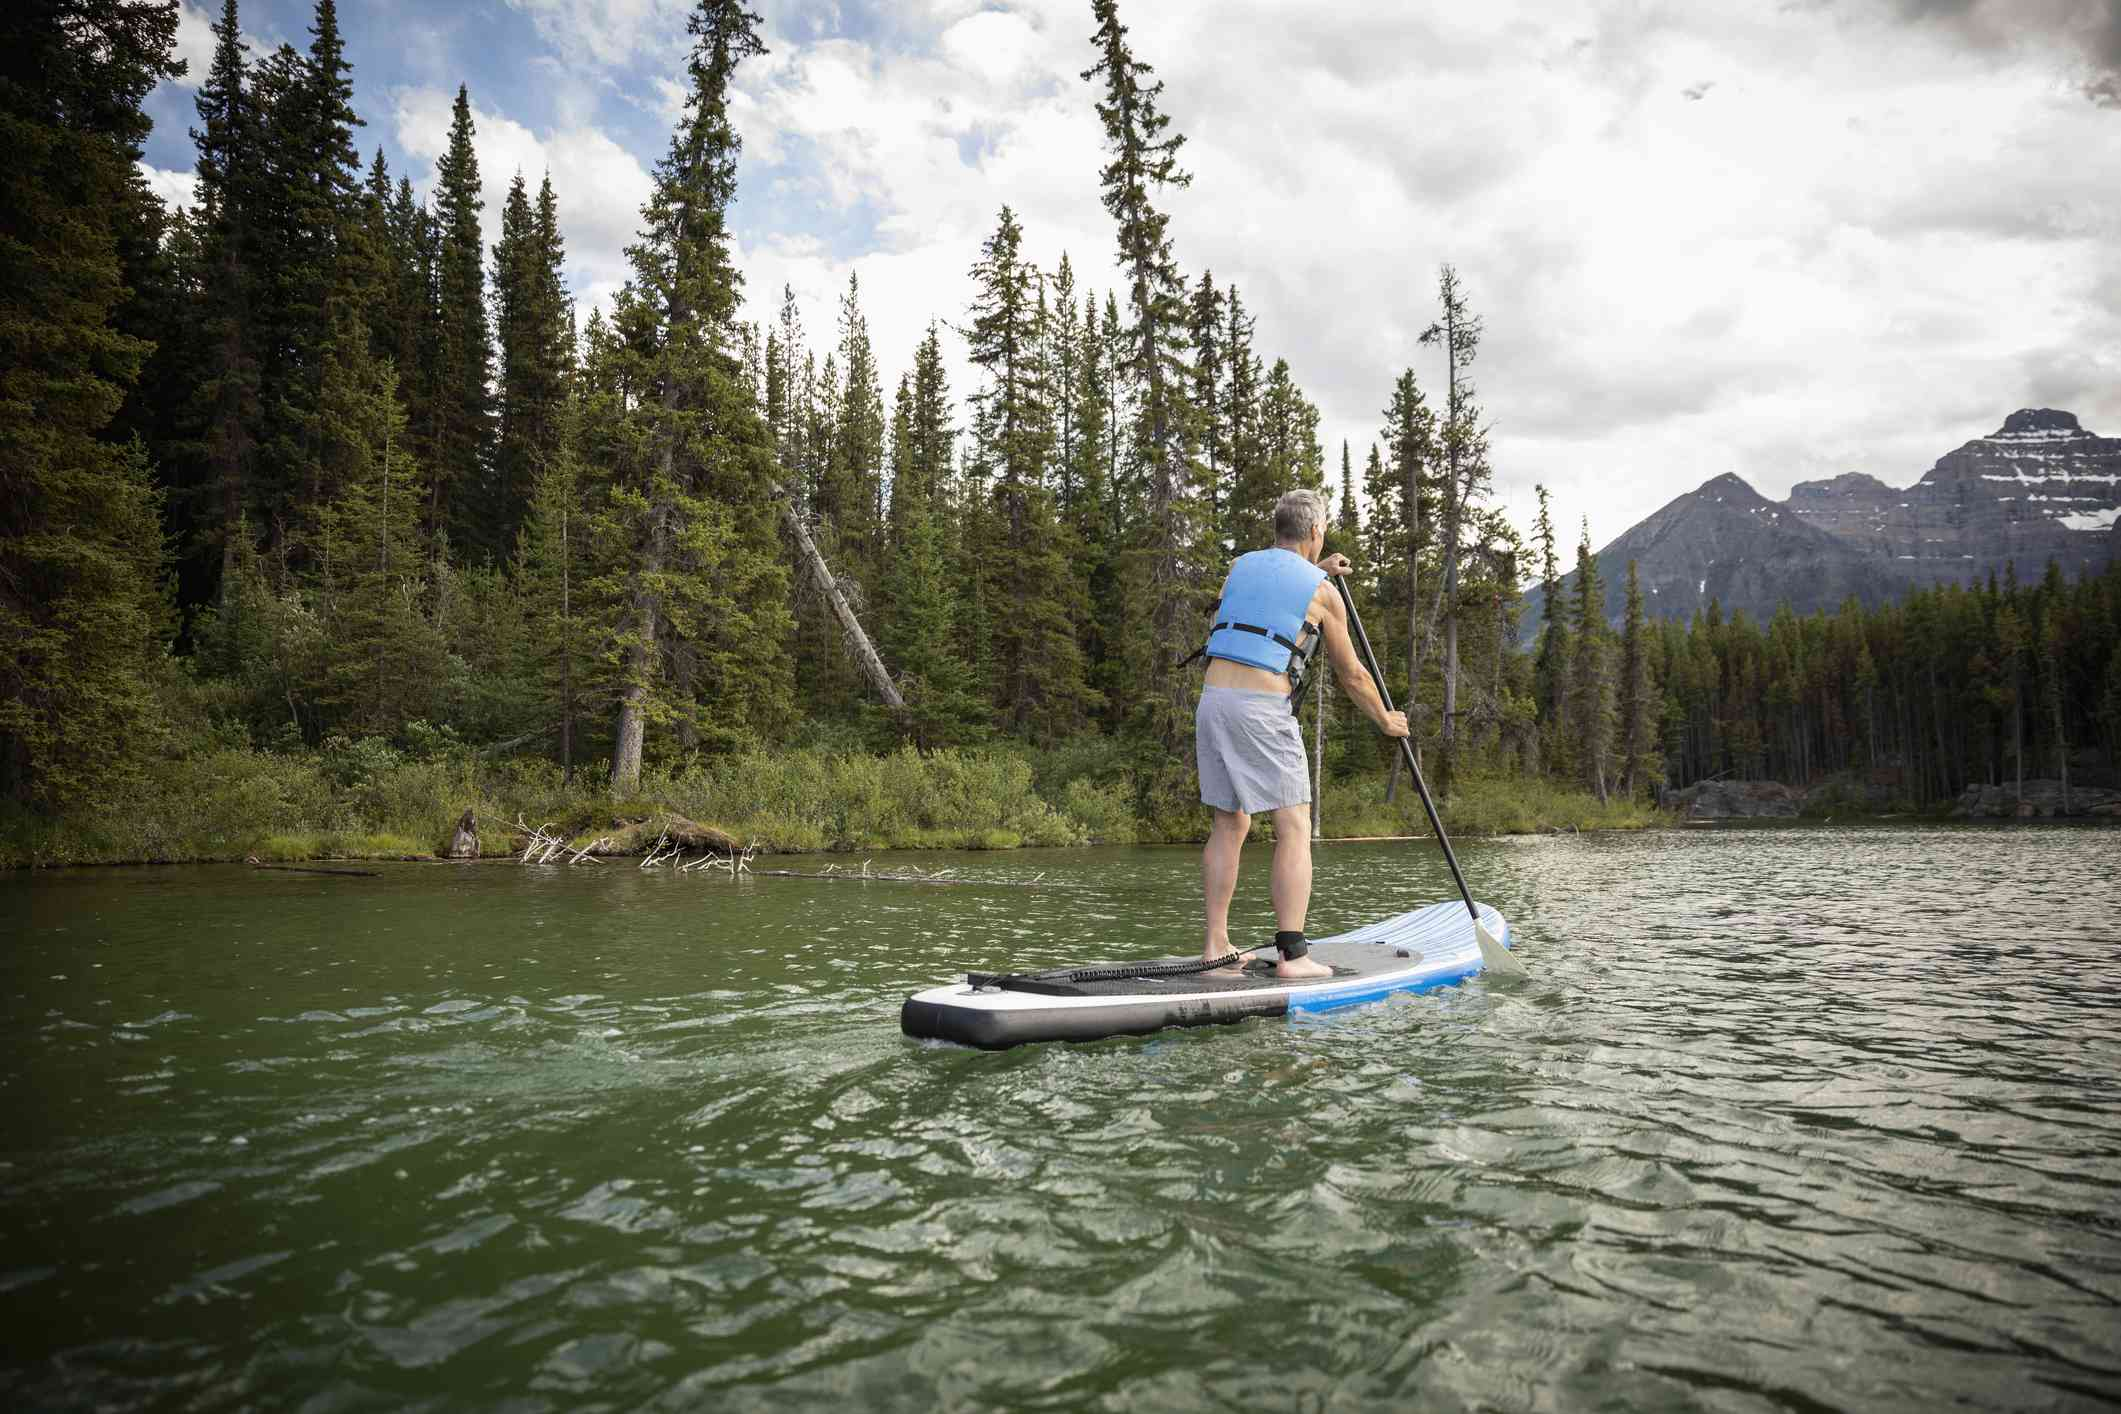 Hombre remando en un lago